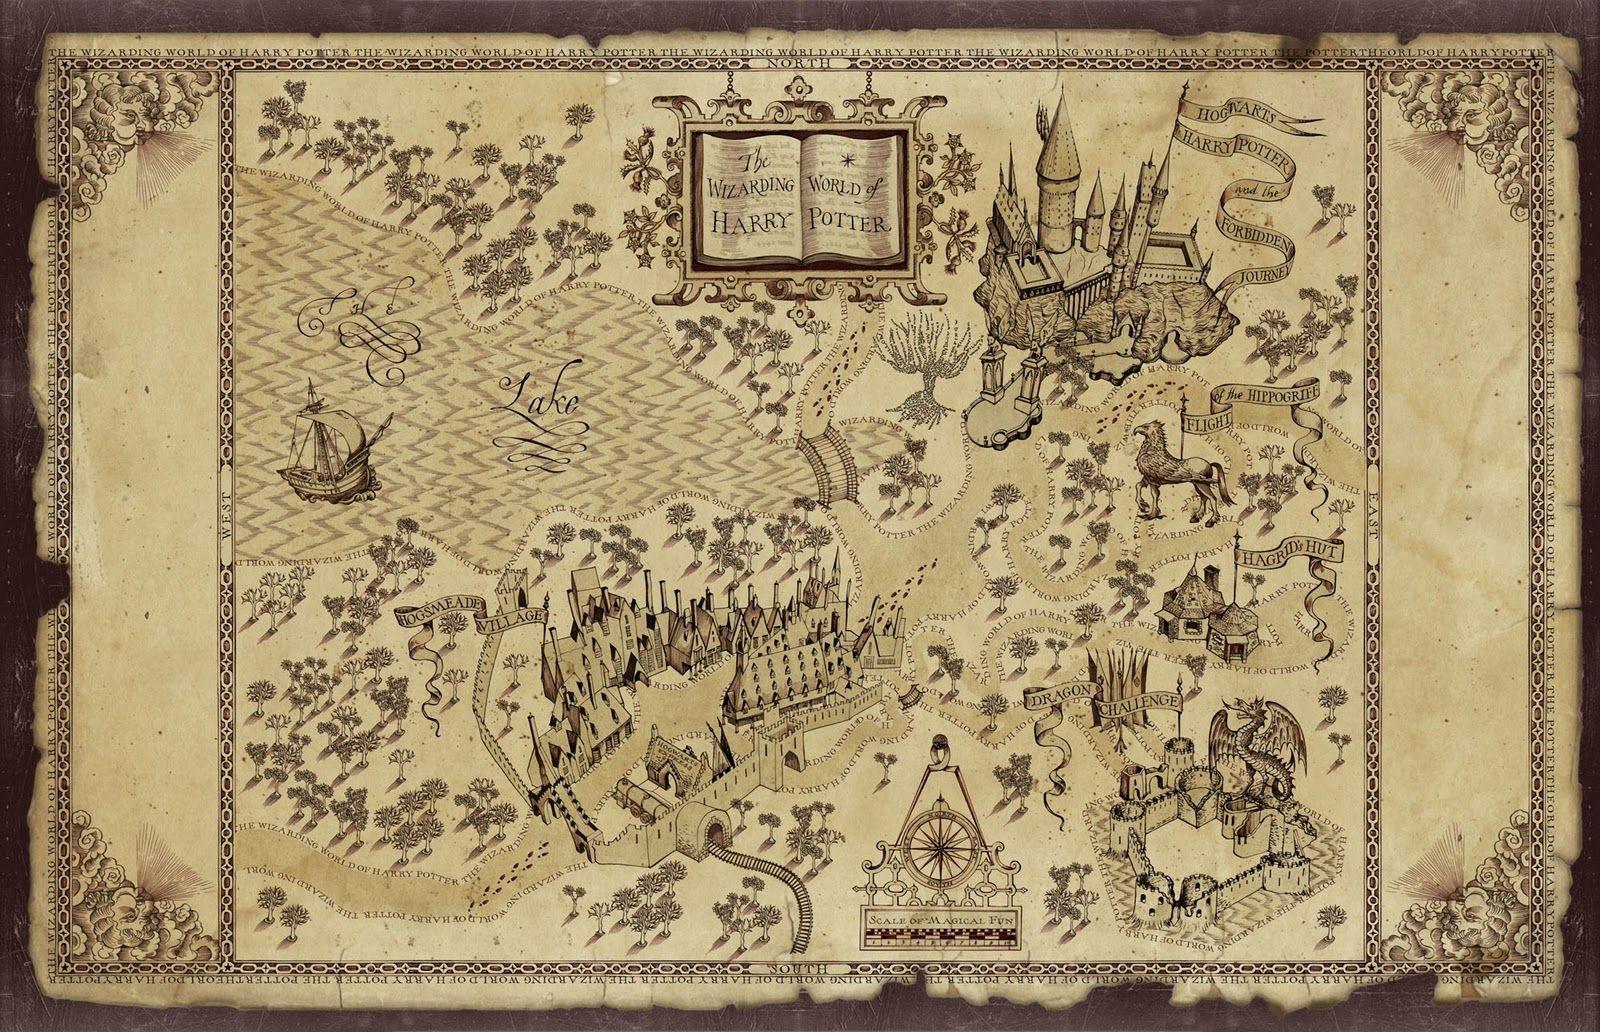 Harry Potter Map   Treasure Map Inspiration   Harry Potter - Free Printable Marauders Map